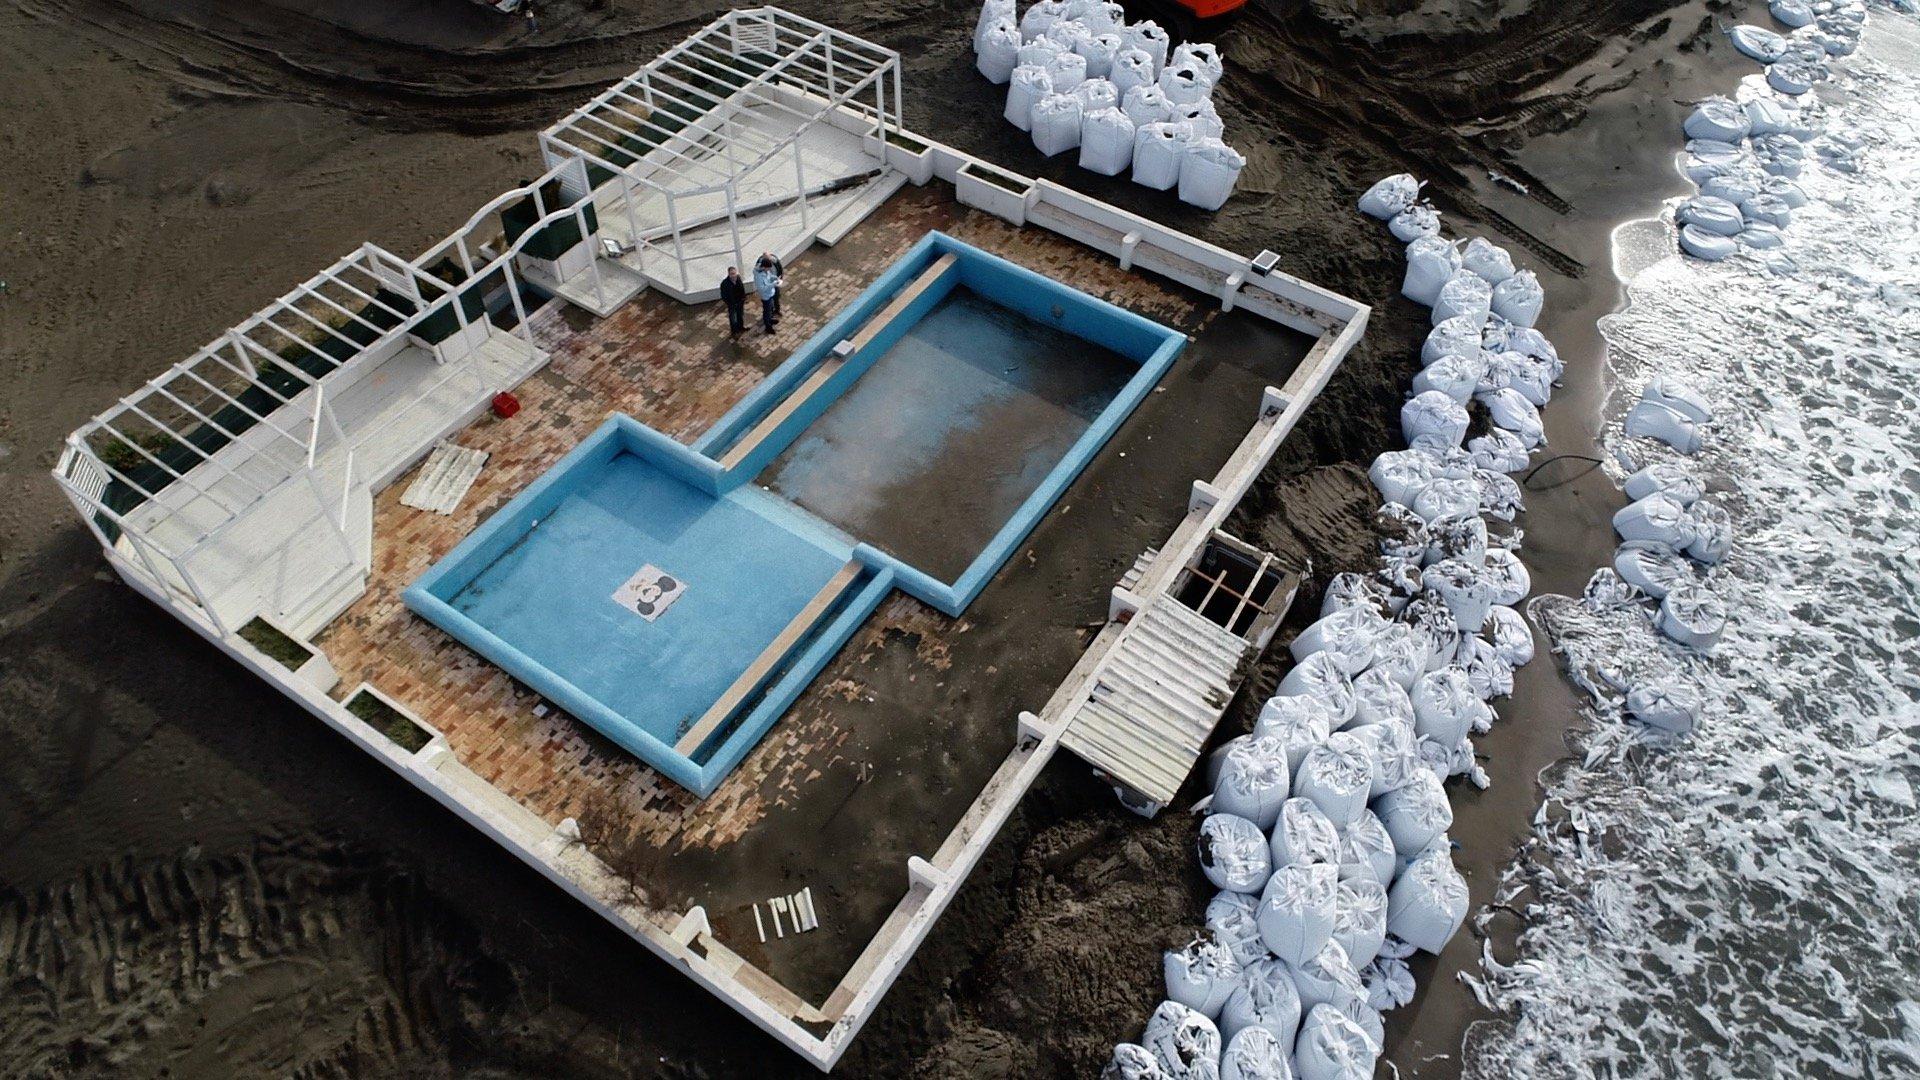 riprese droni roma ostia spiaggia piscina